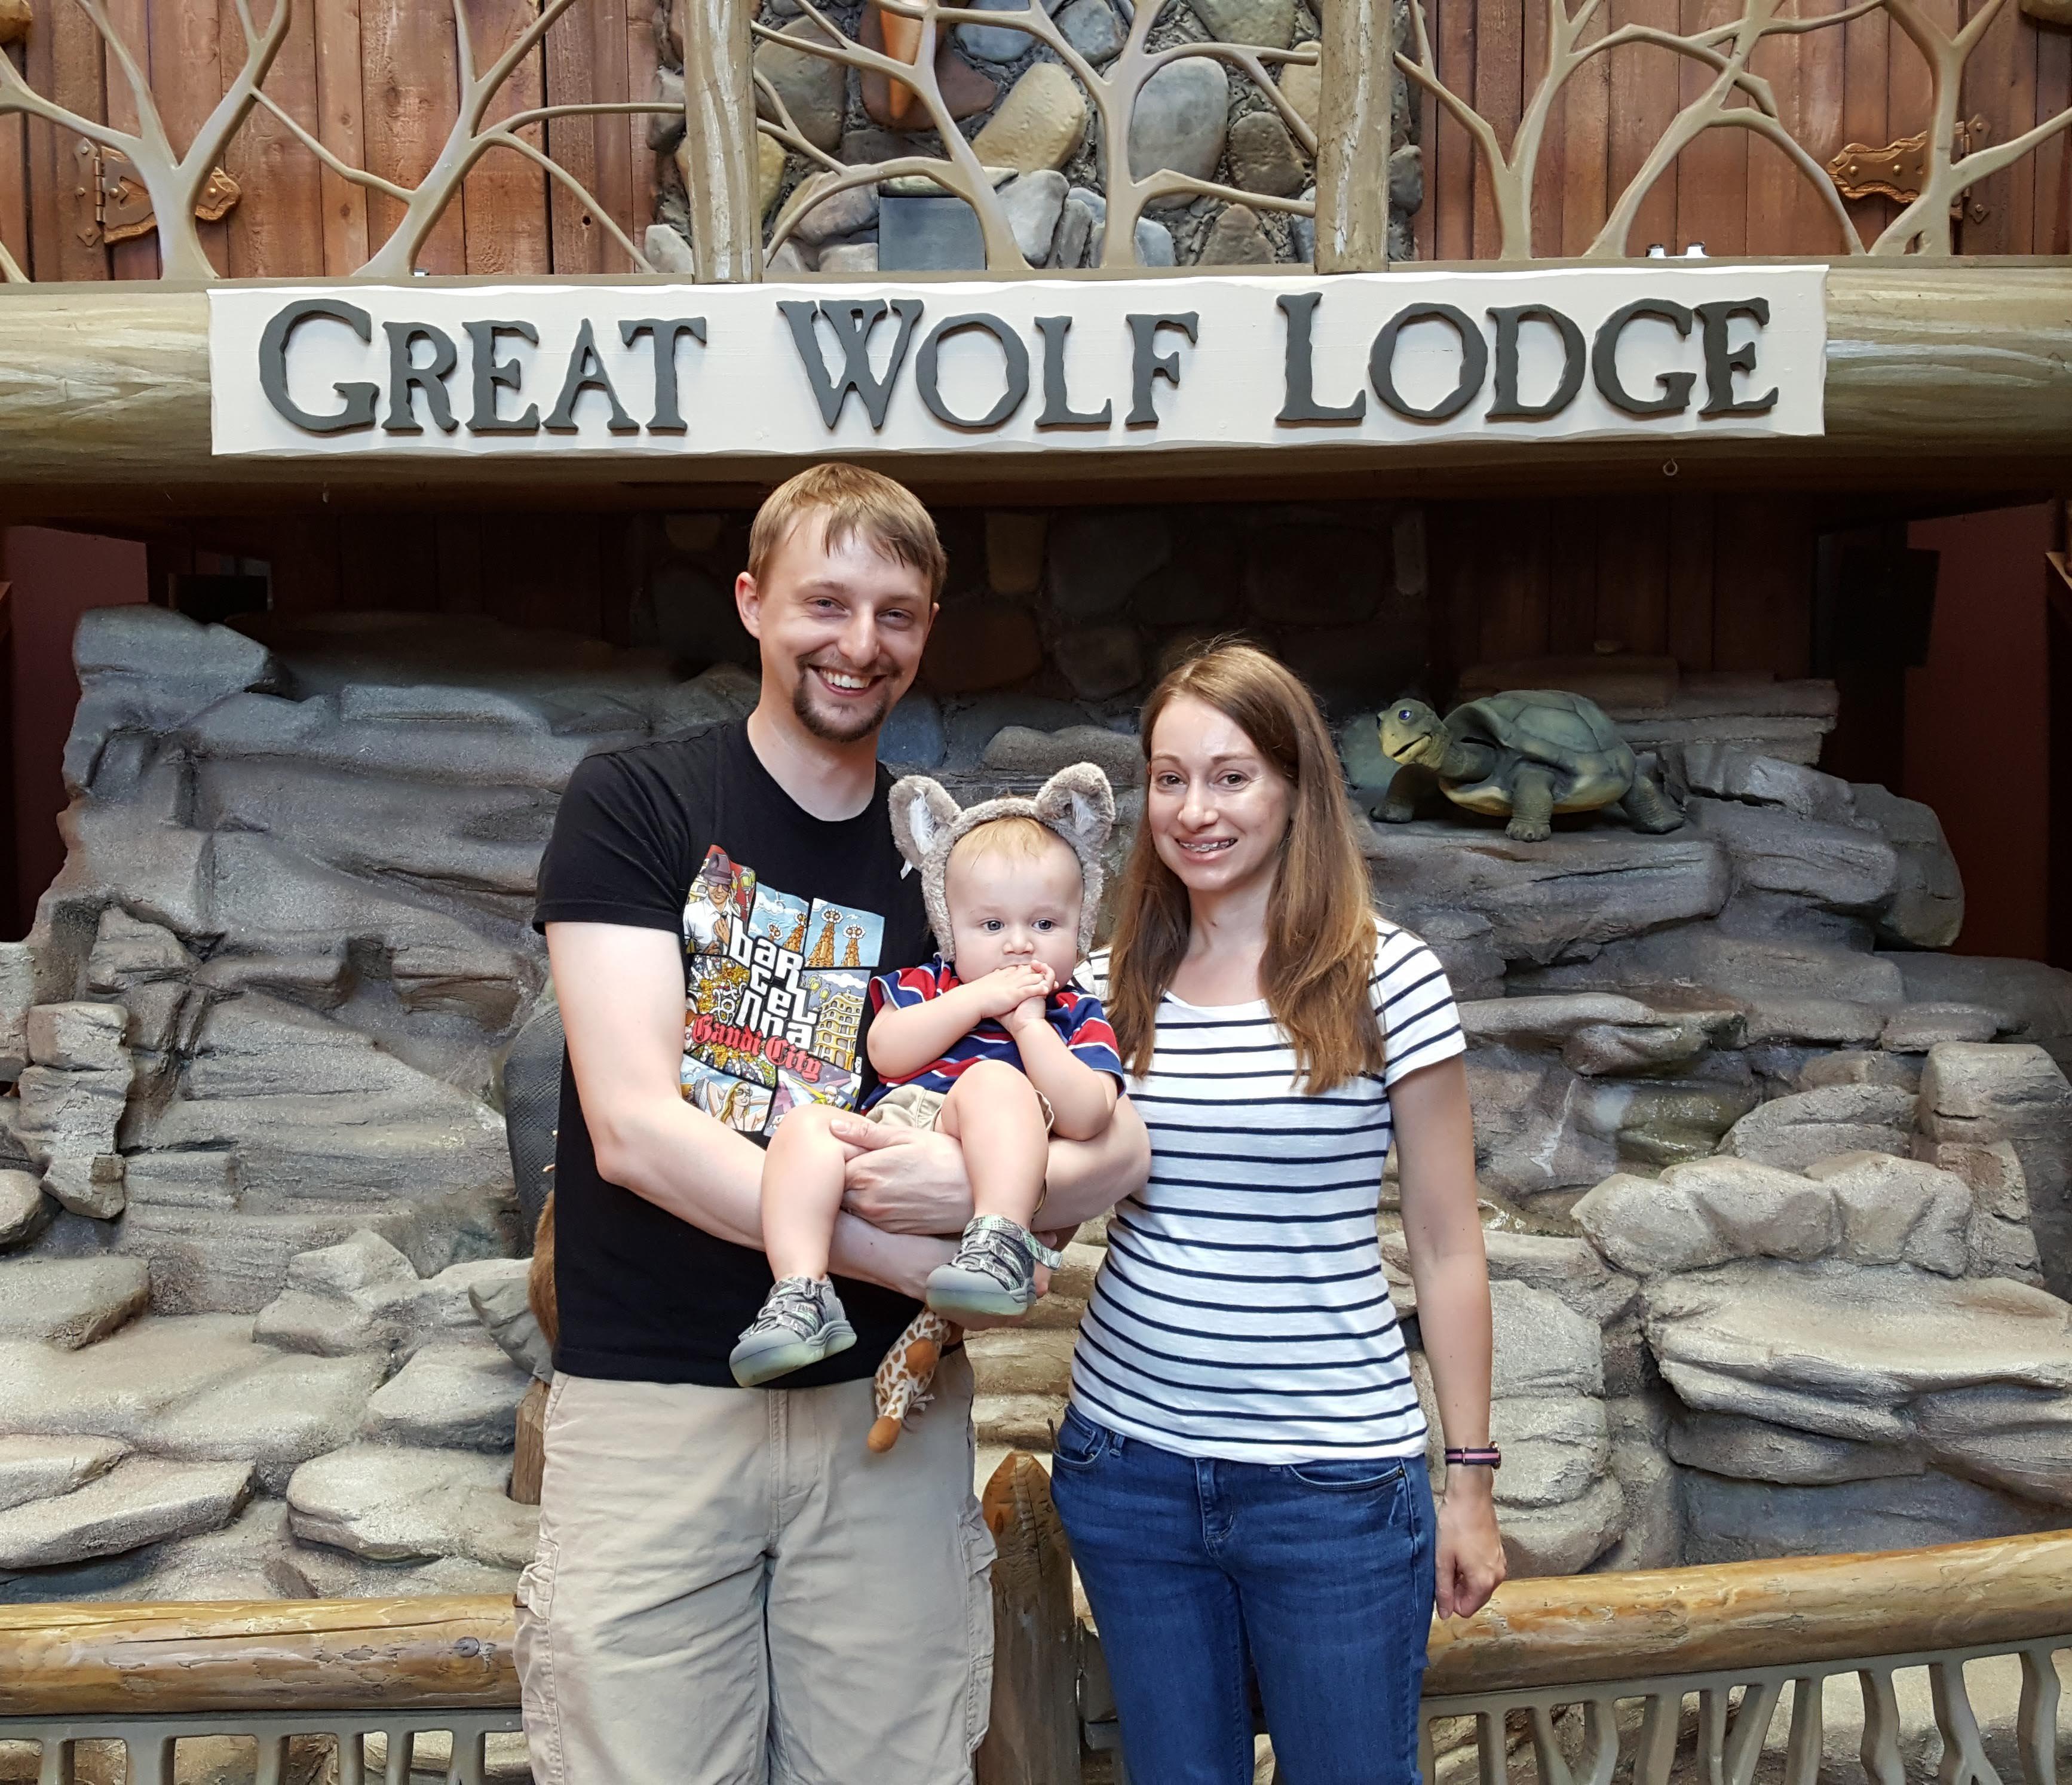 Great Wolf Lodge July 2018   https://www.roseclearfield.com